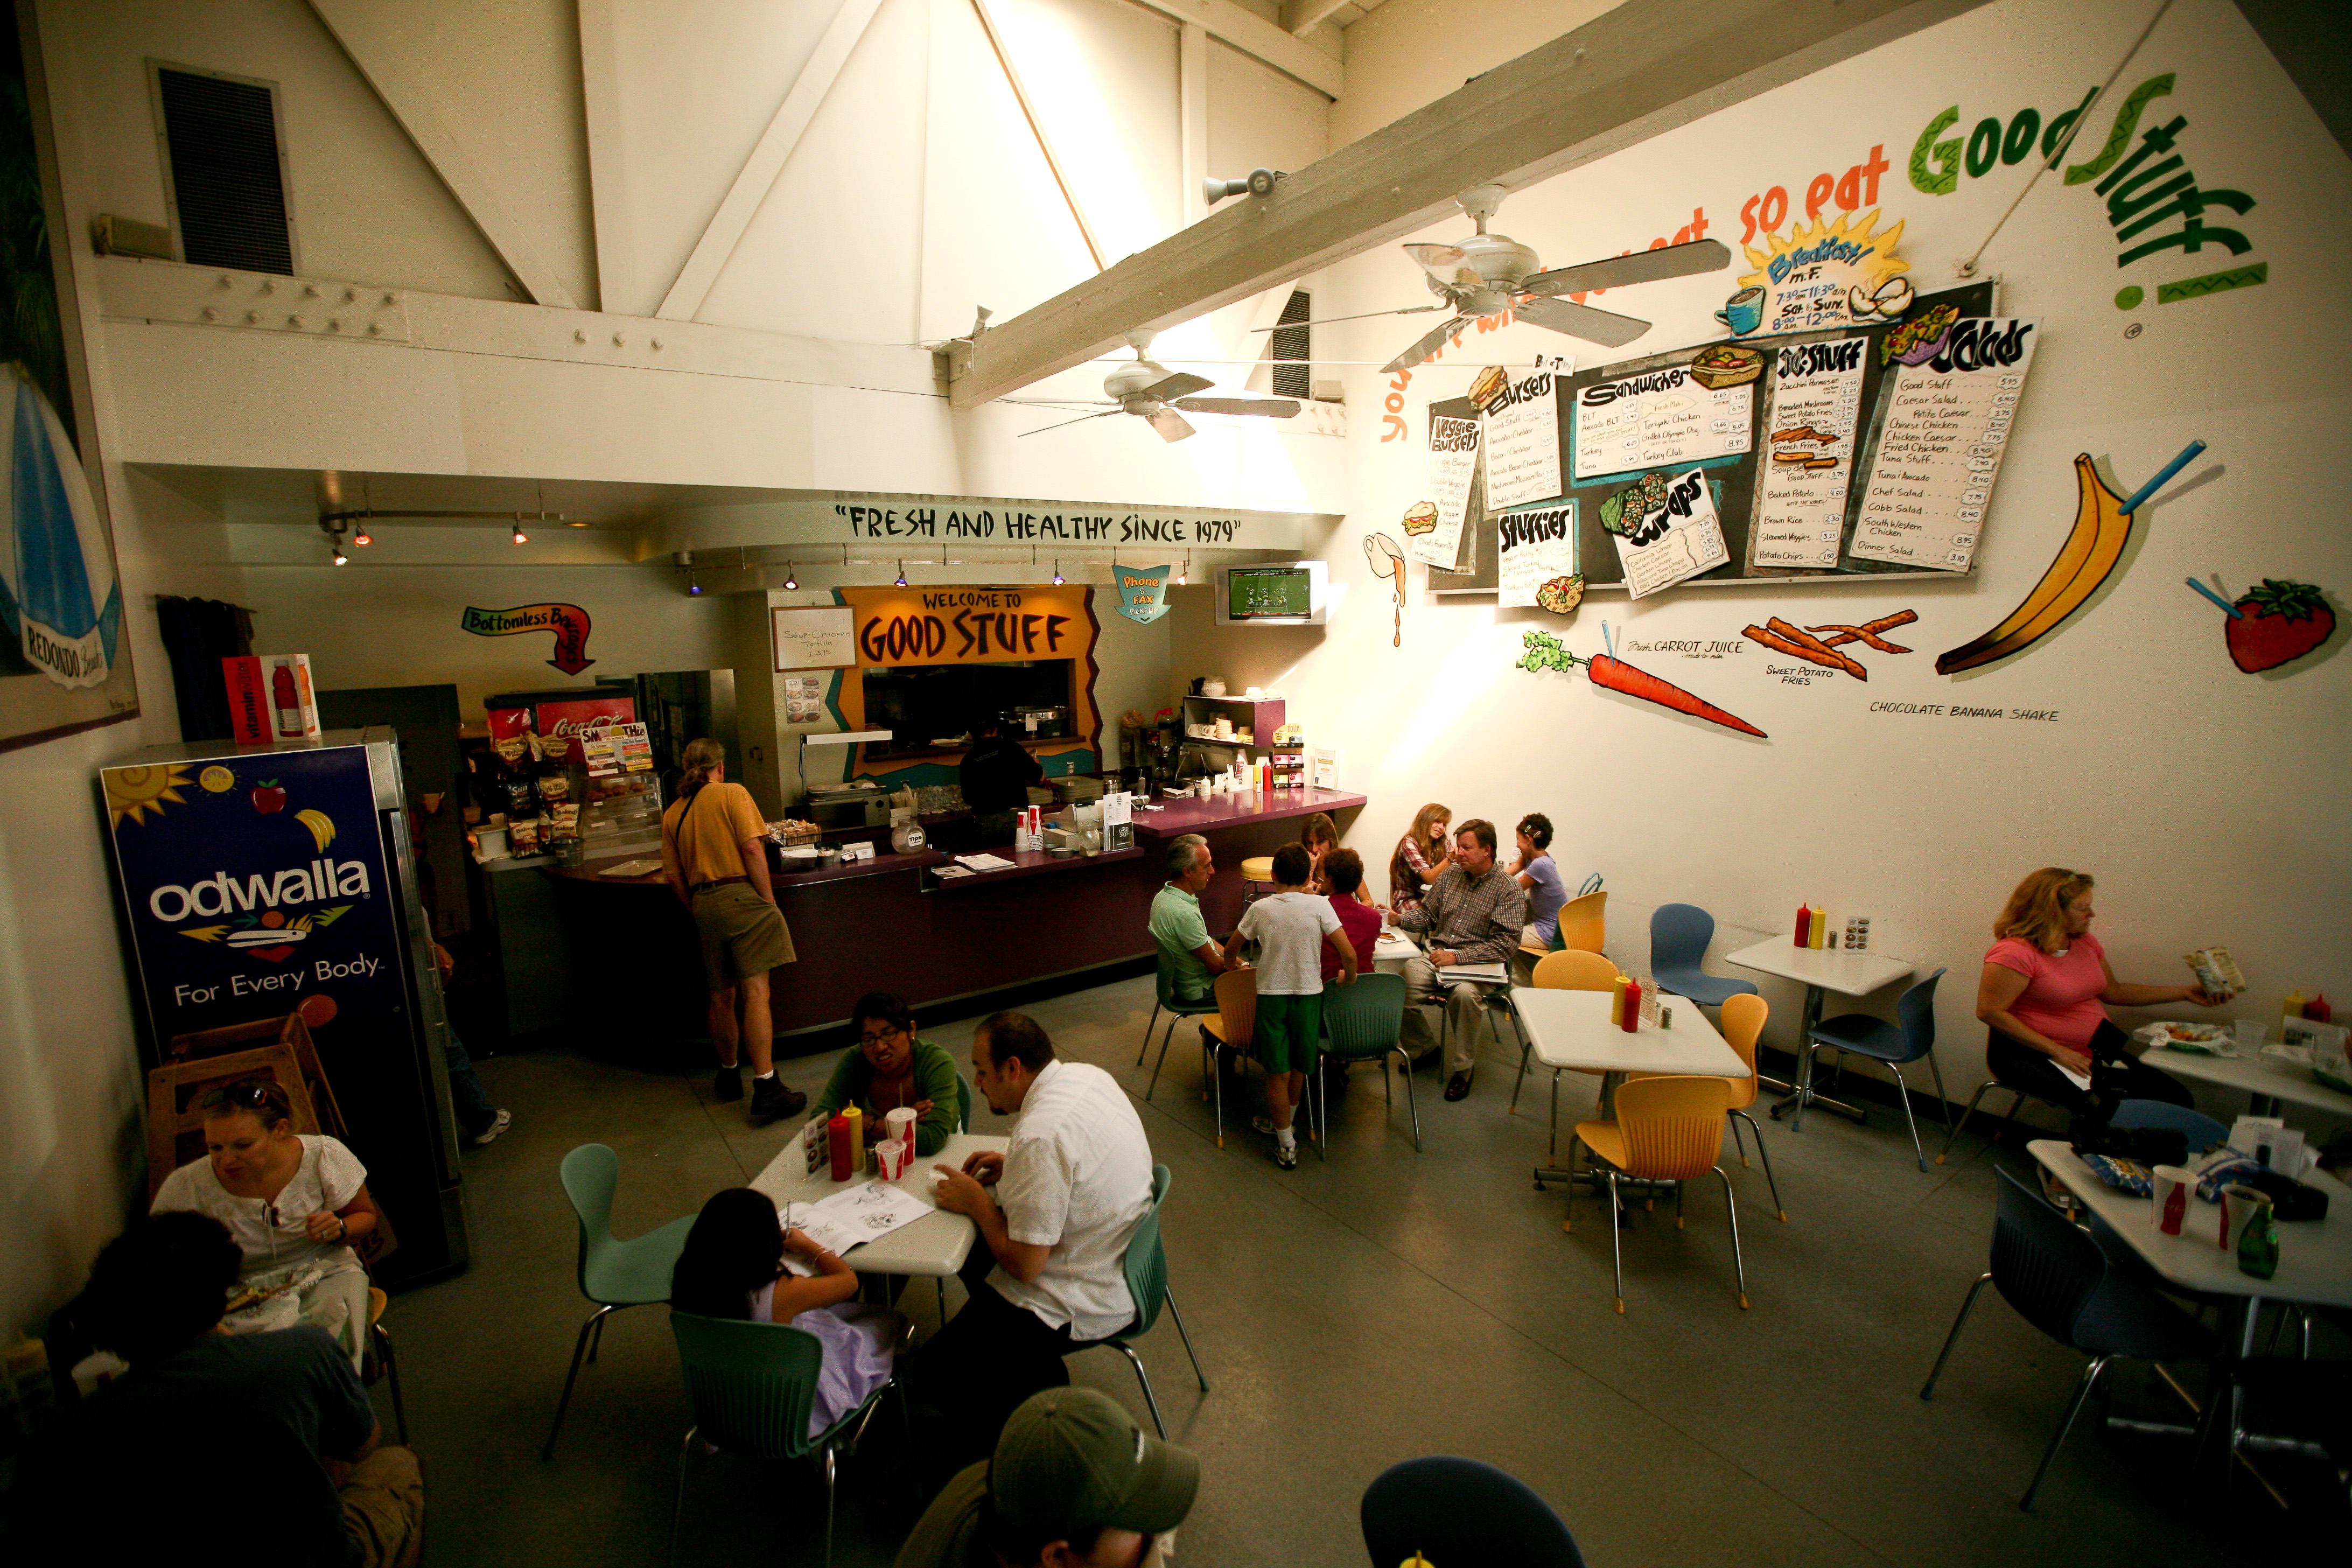 Dining Room at Good Stuff Burgers